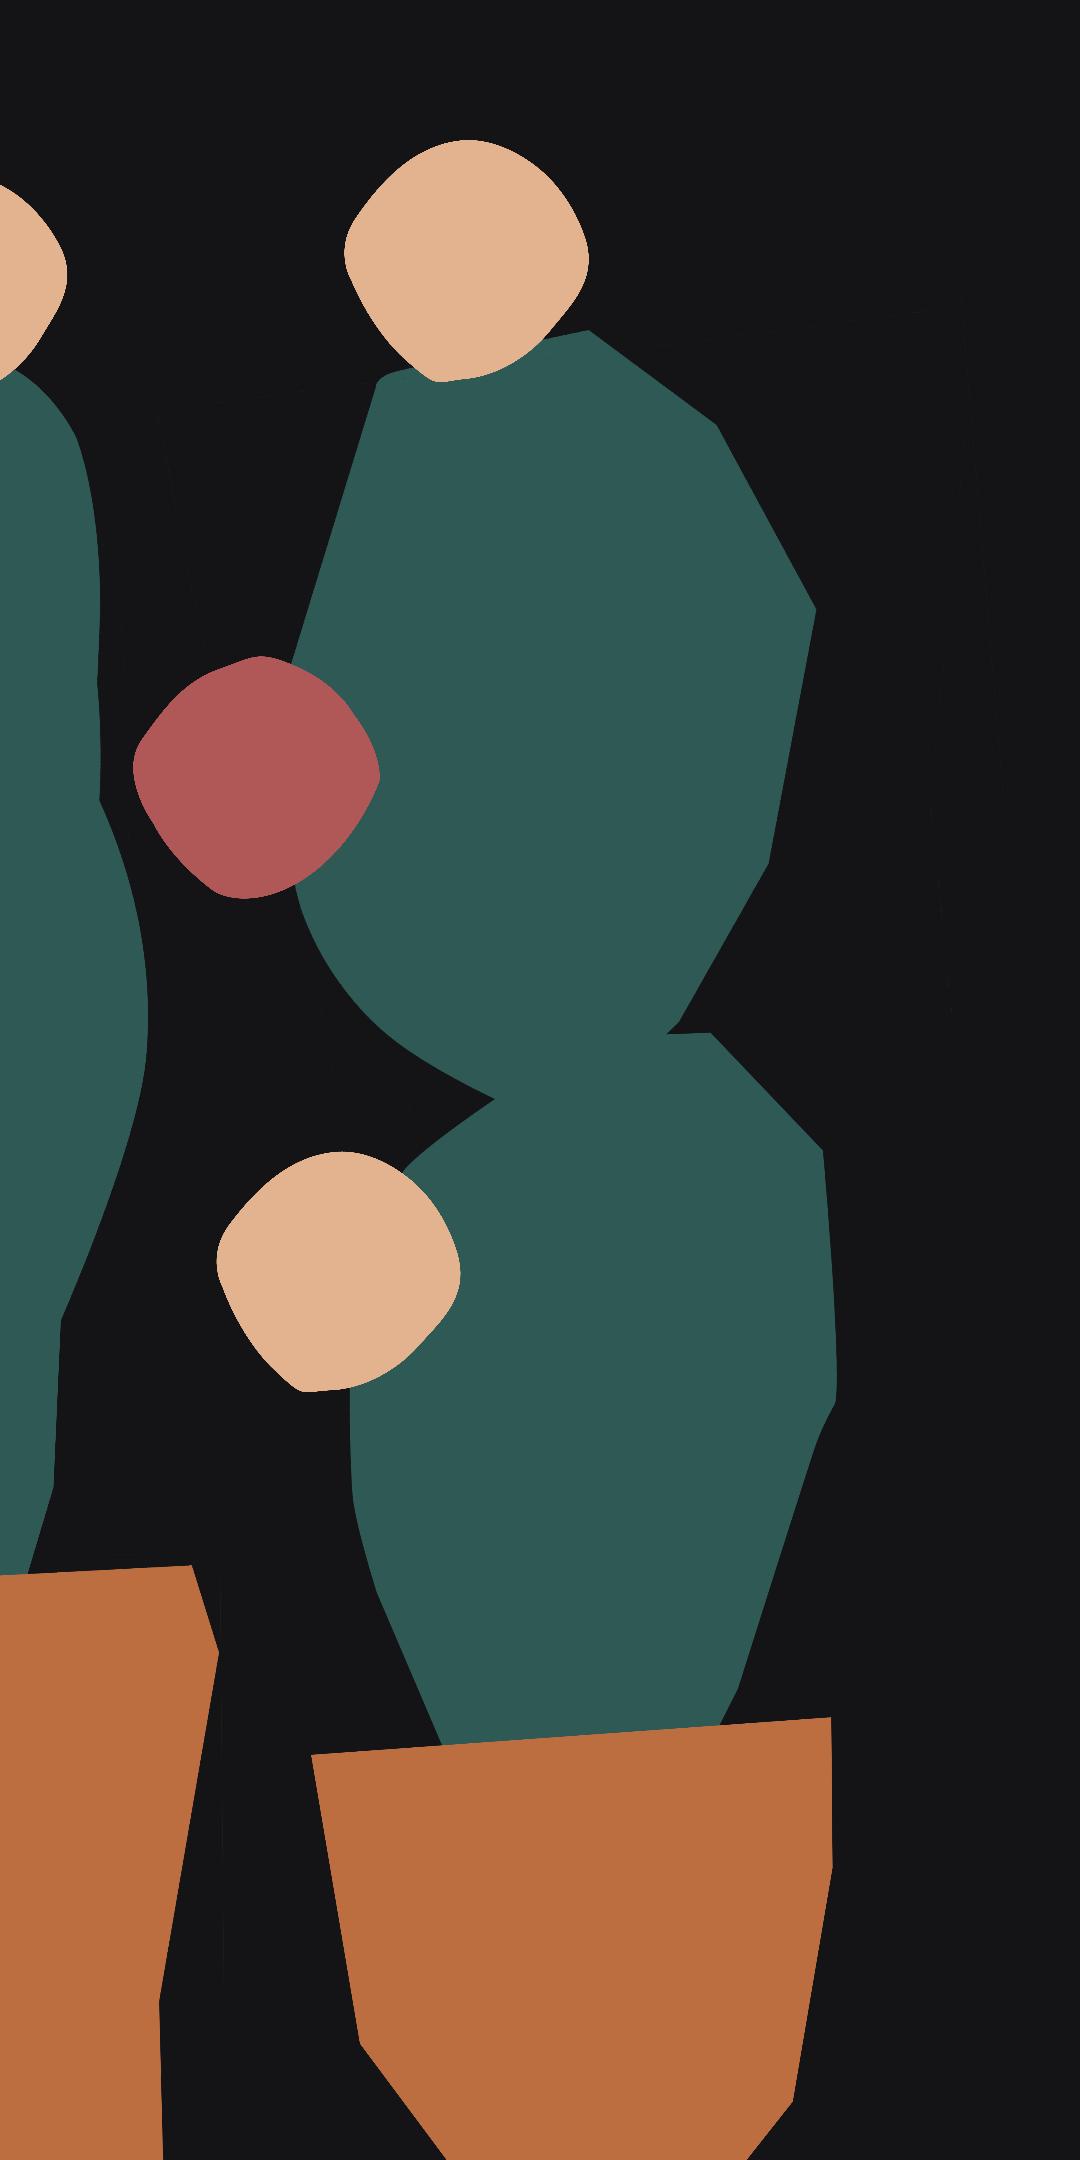 Pixel 4 Wallpaper (YTECHB Exclusive)